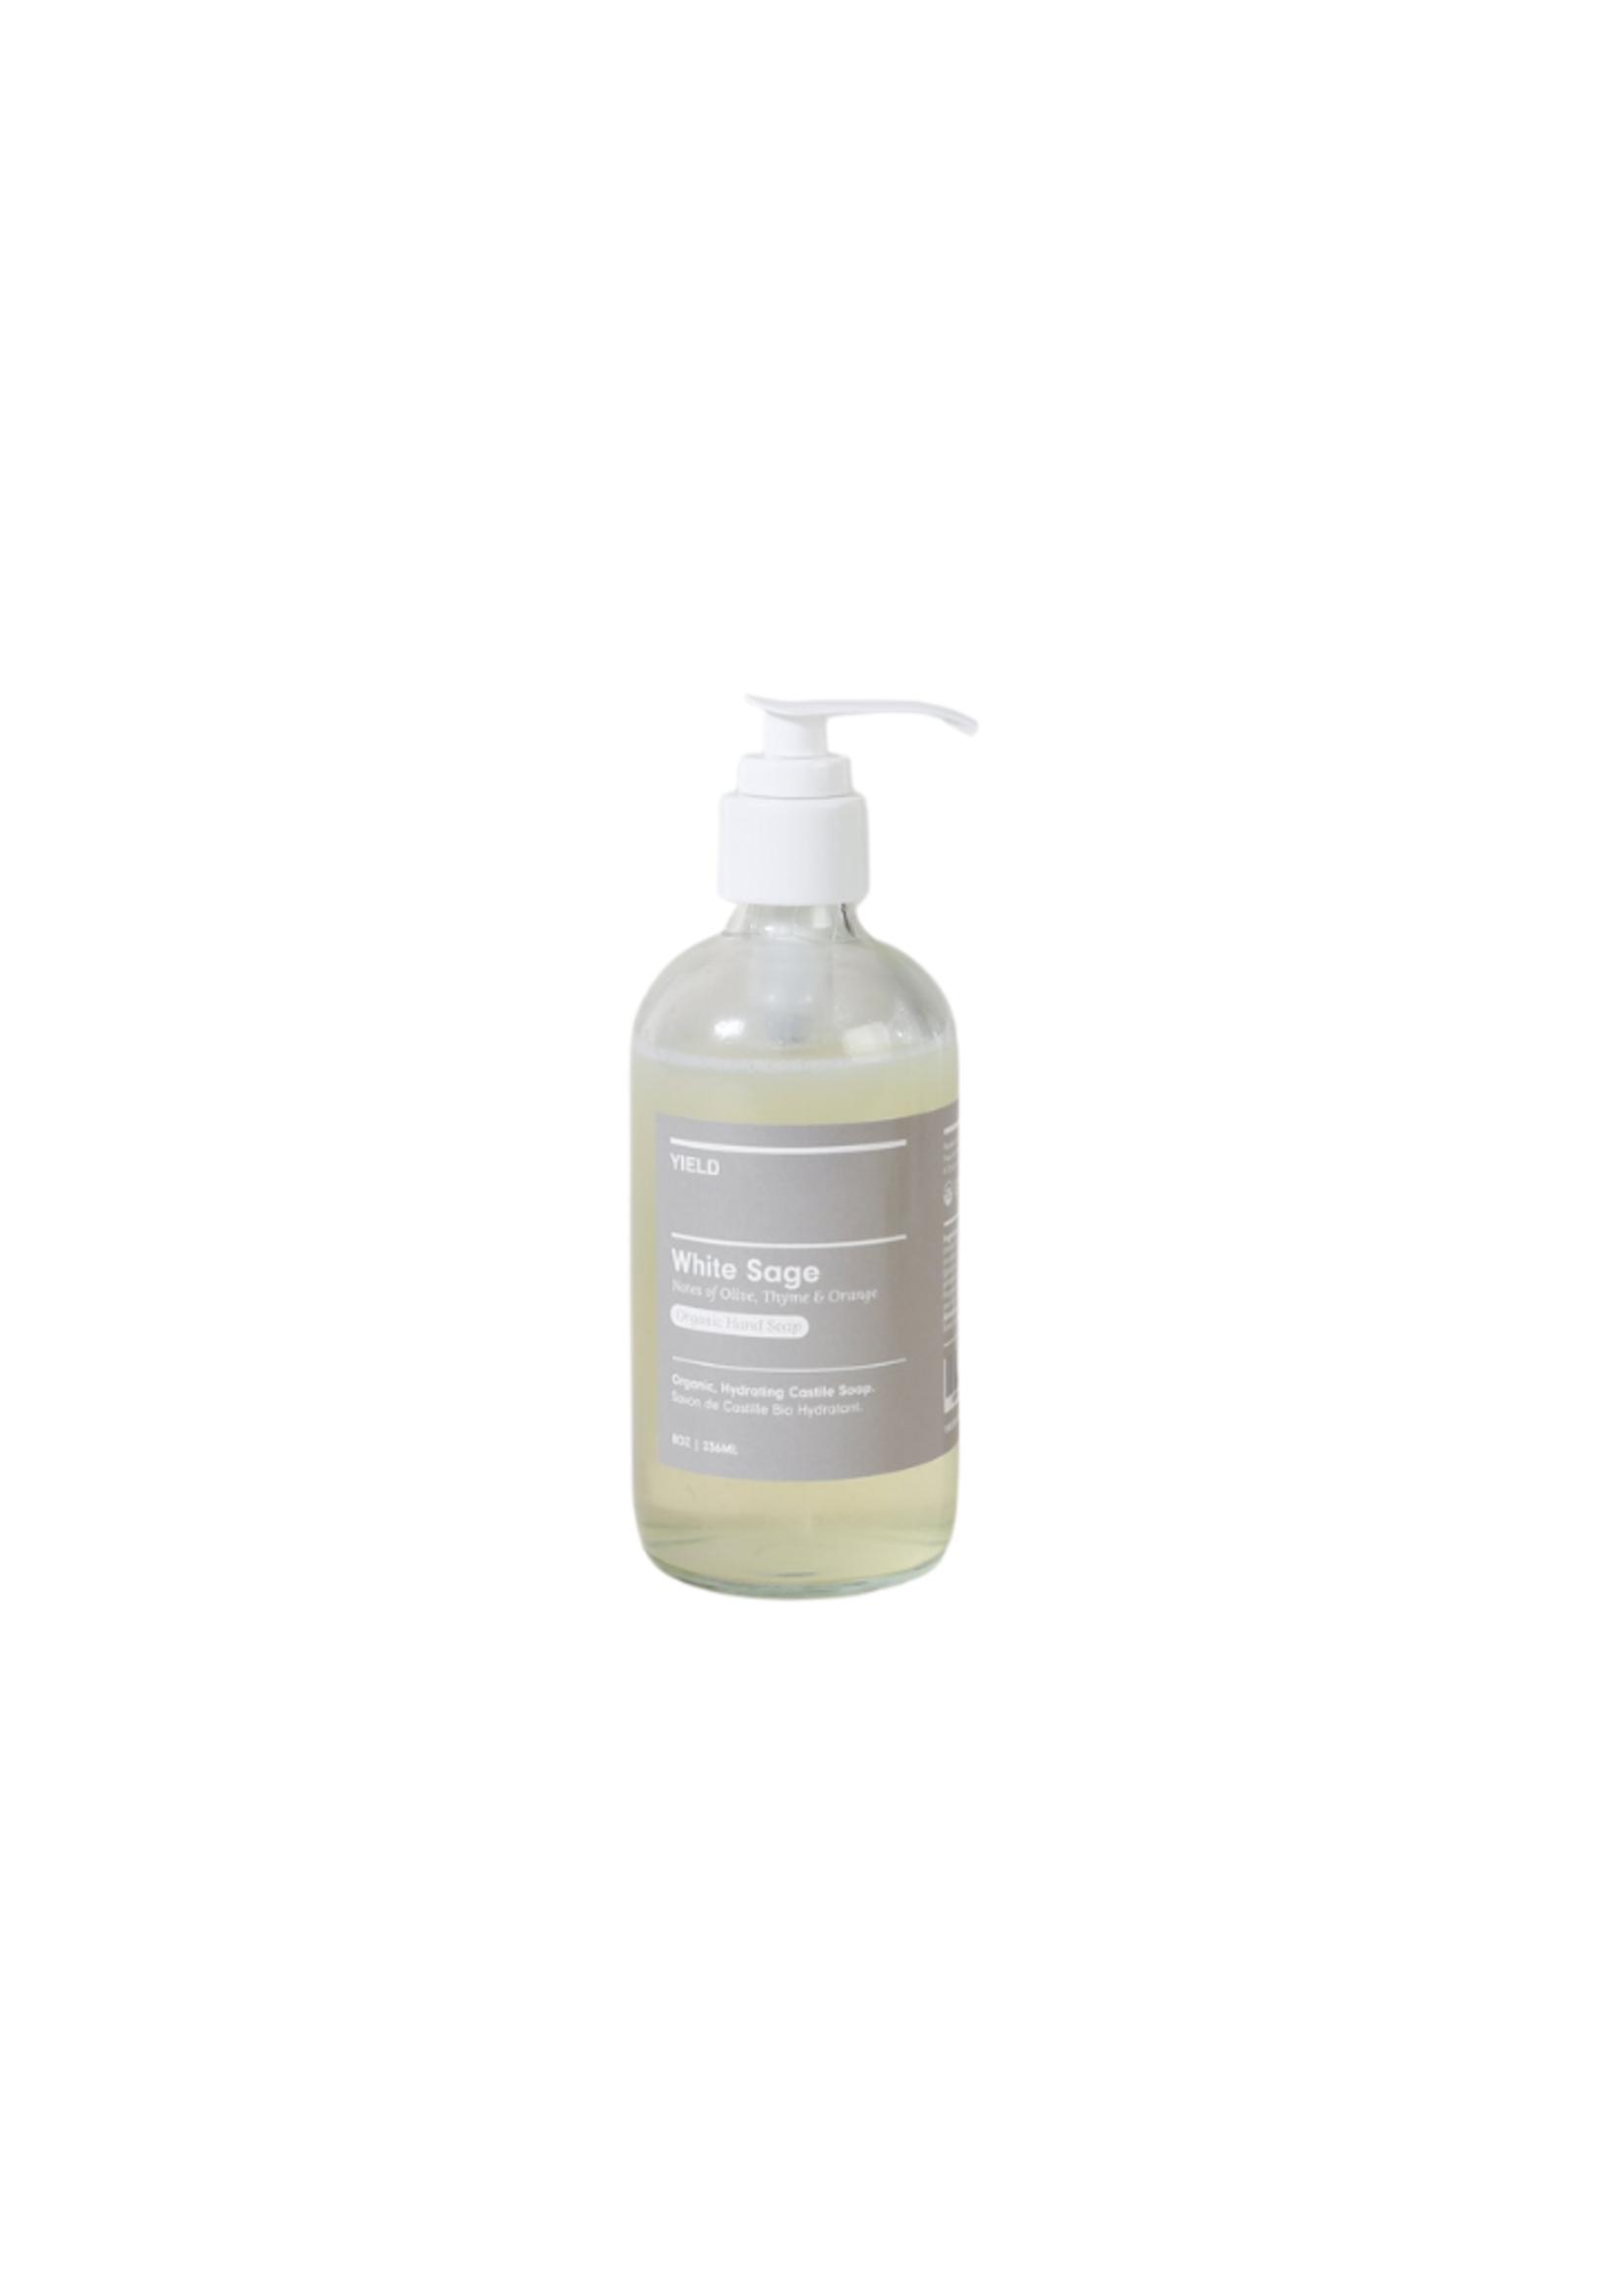 Yield Design Co White Sage Organic Hand Soap - 8oz Bottle